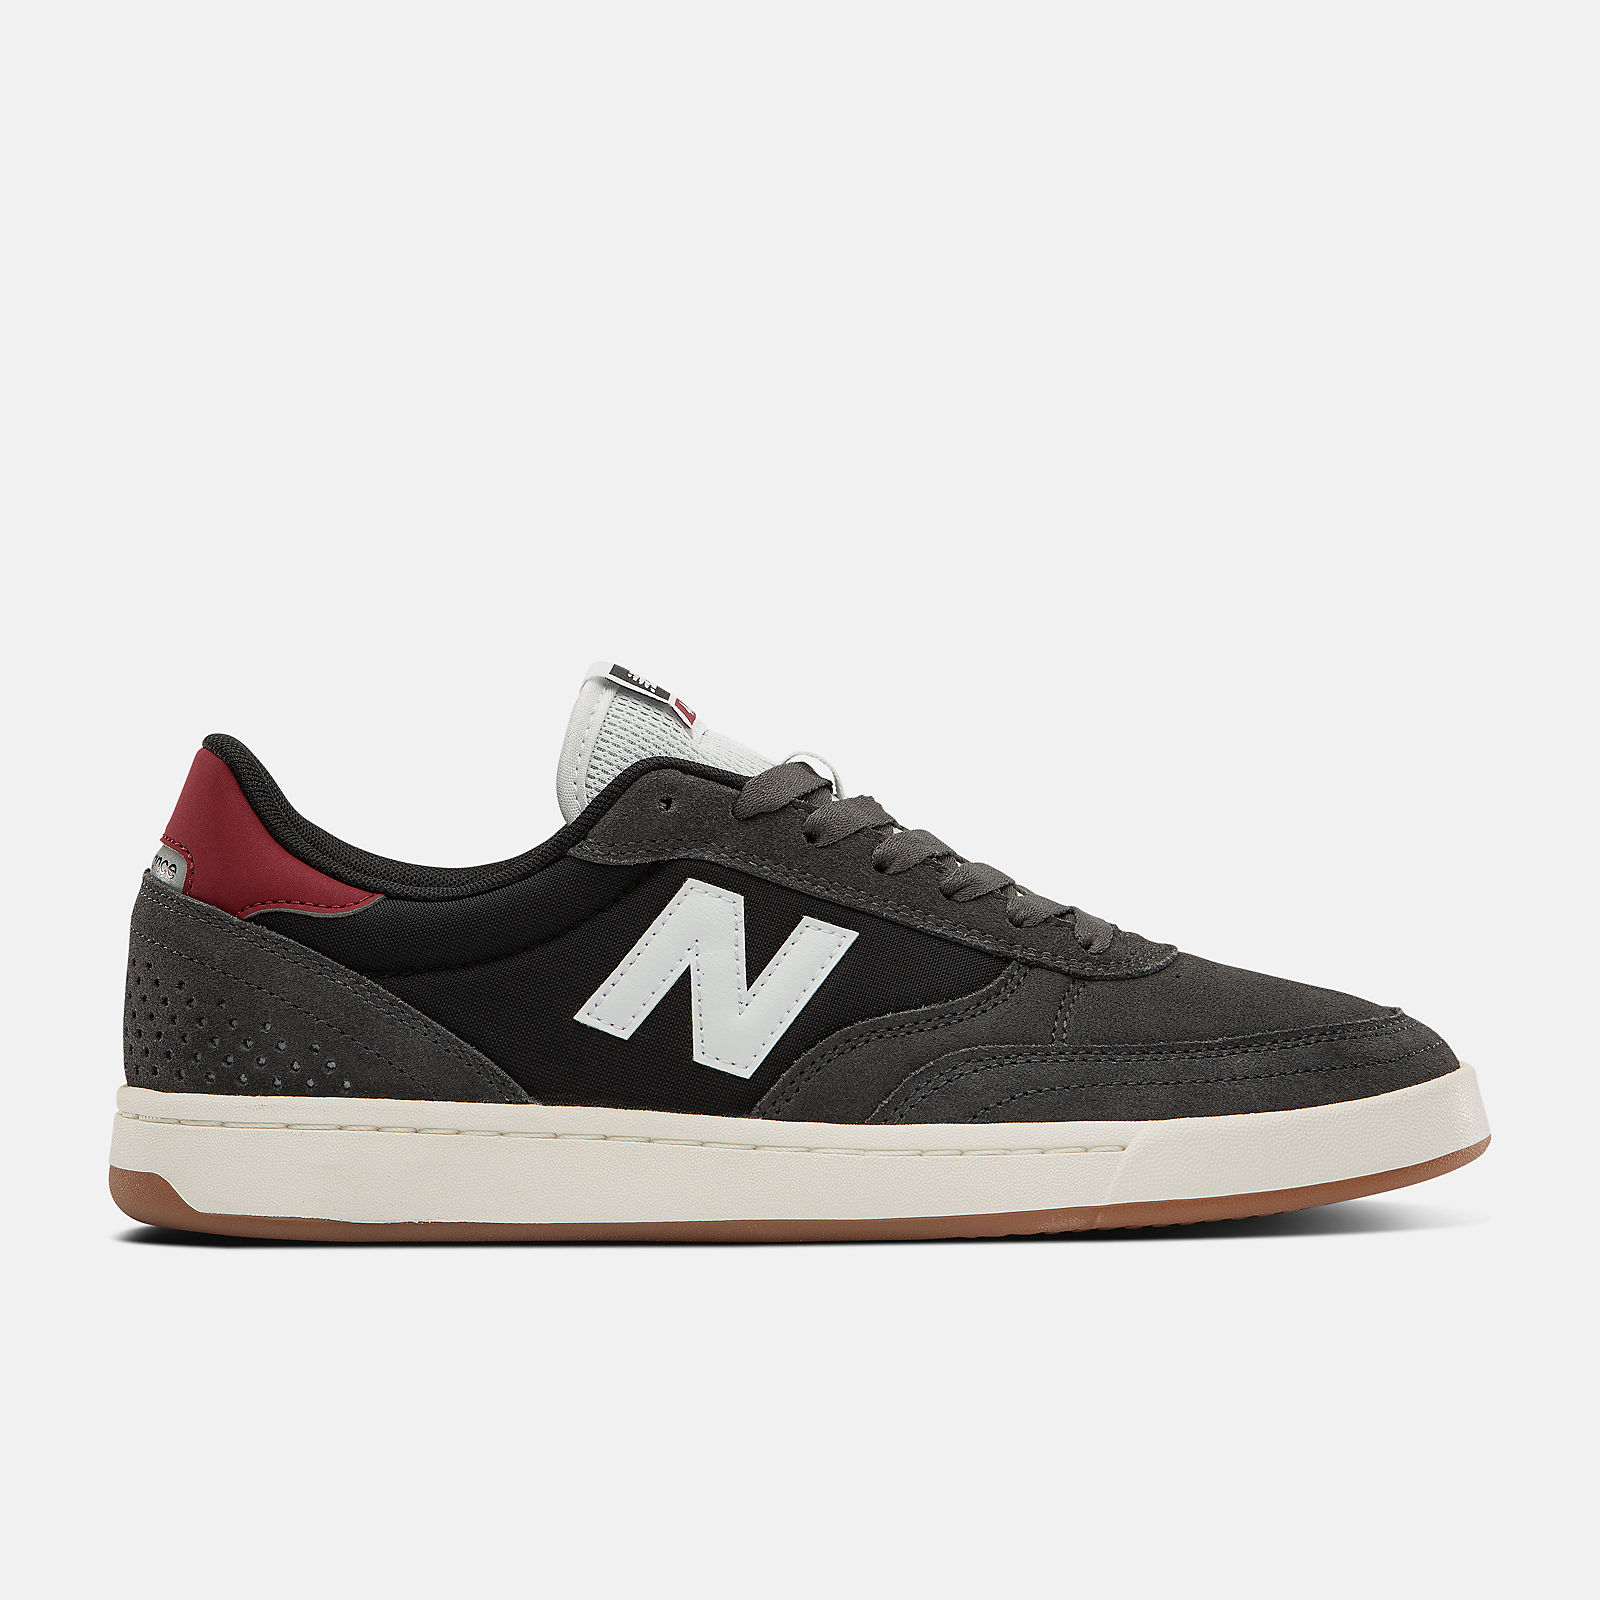 New Balance Numeric NM440 - New Balance